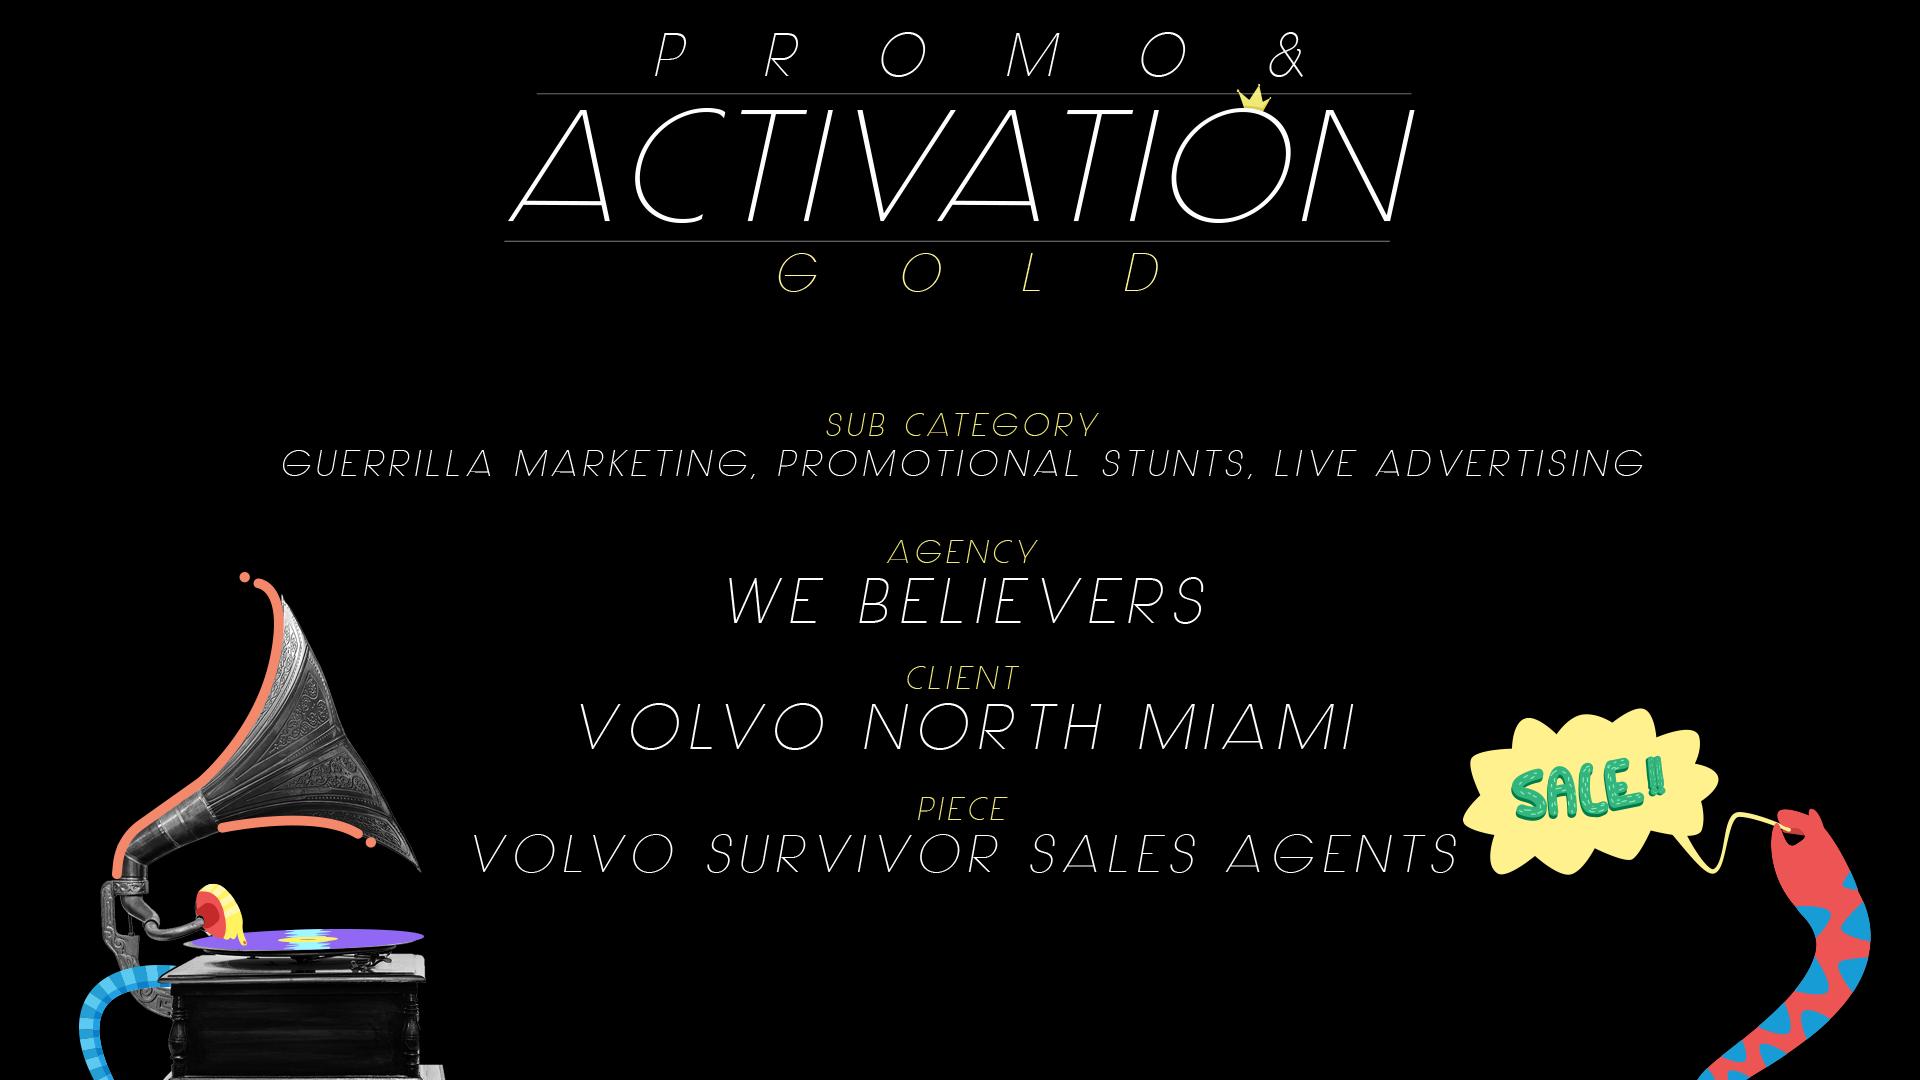 PLACAS GOLD-promo activation-GUERILLA MARKETING.png